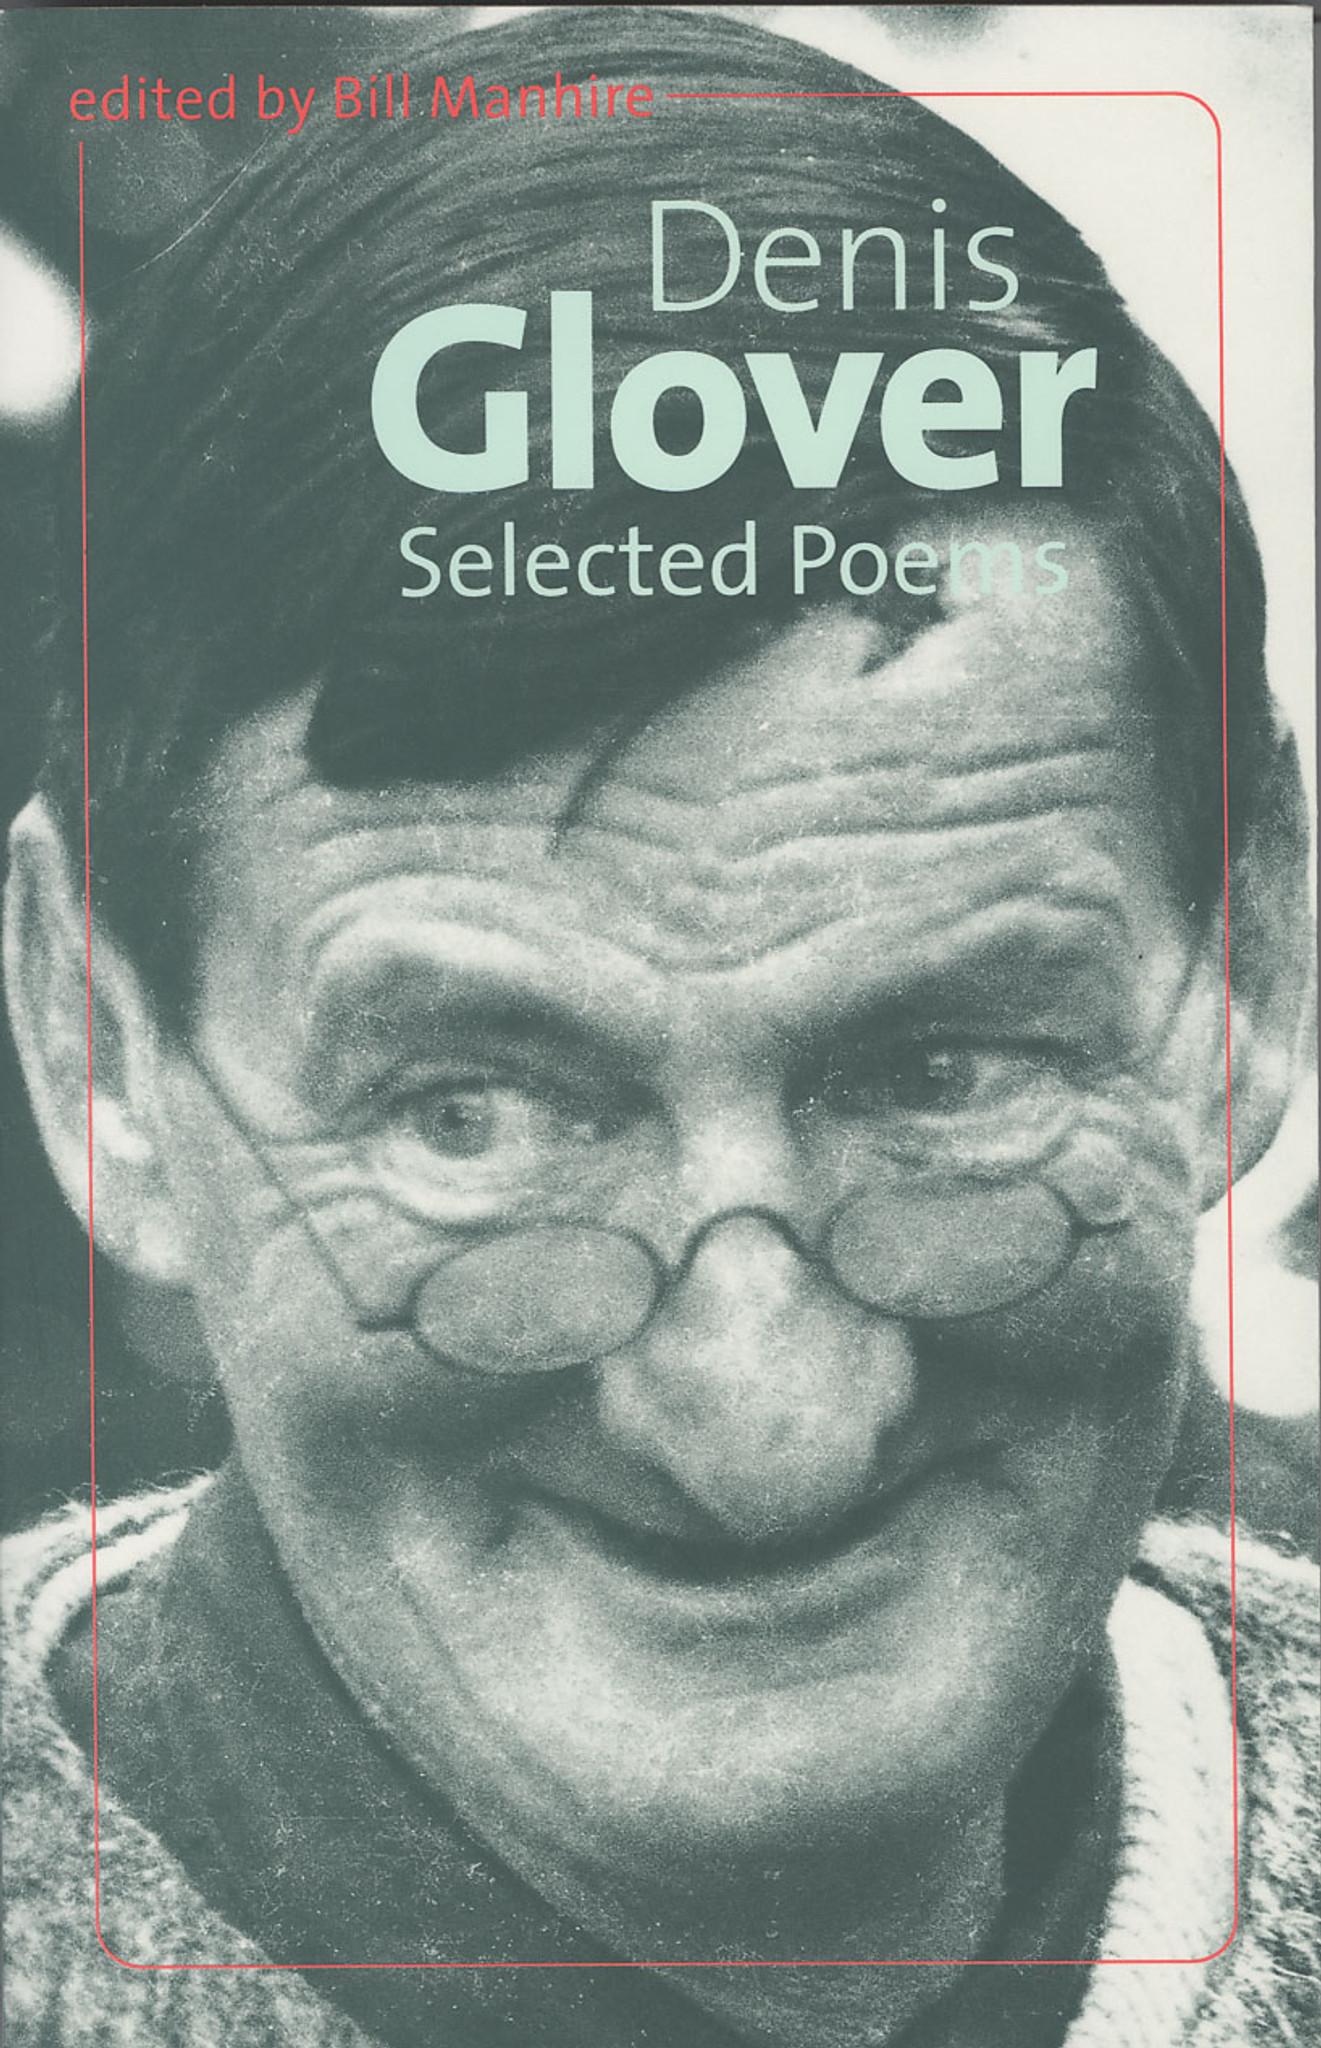 Denis Glover ian milner